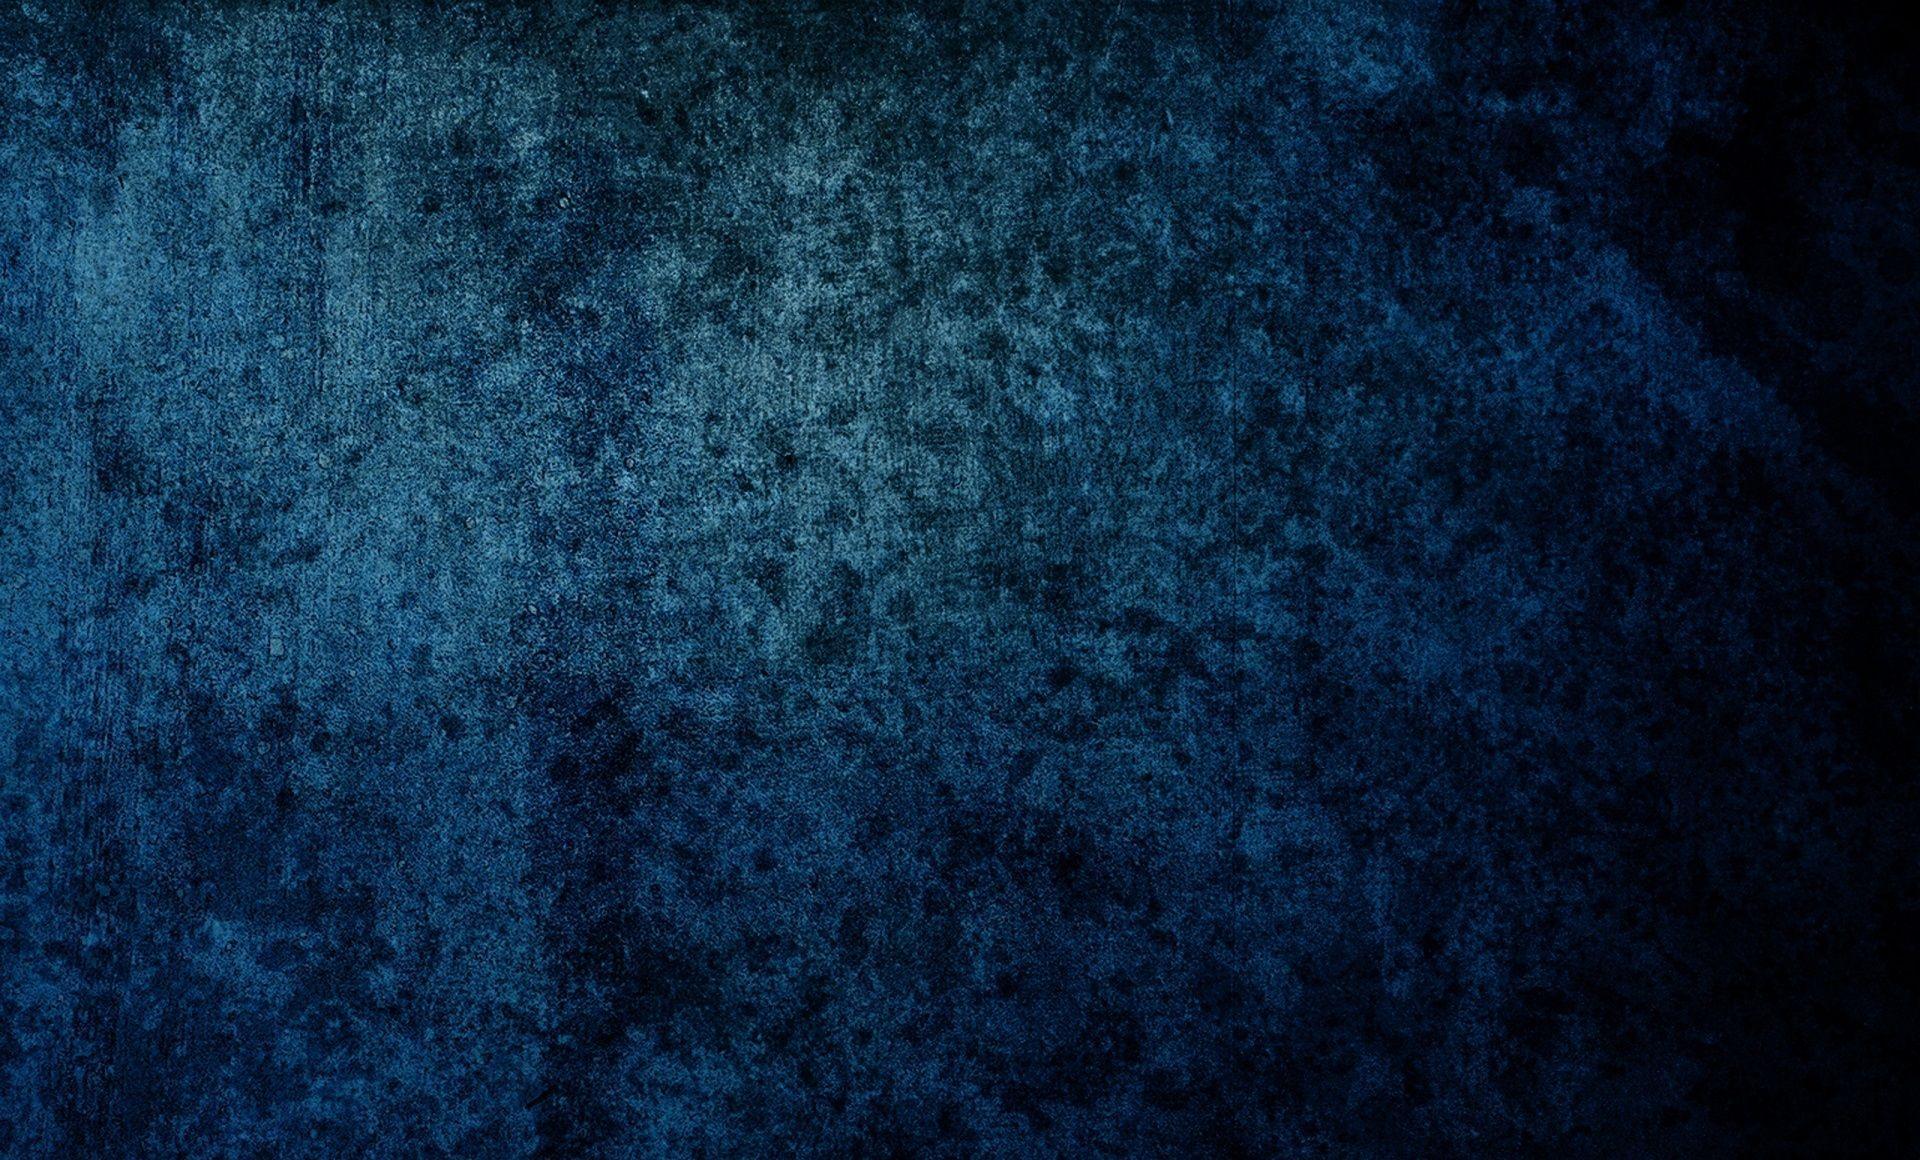 Samsung 4k Desktop Wallpapers Top Free Samsung 4k Desktop Backgrounds Wallpaperaccess